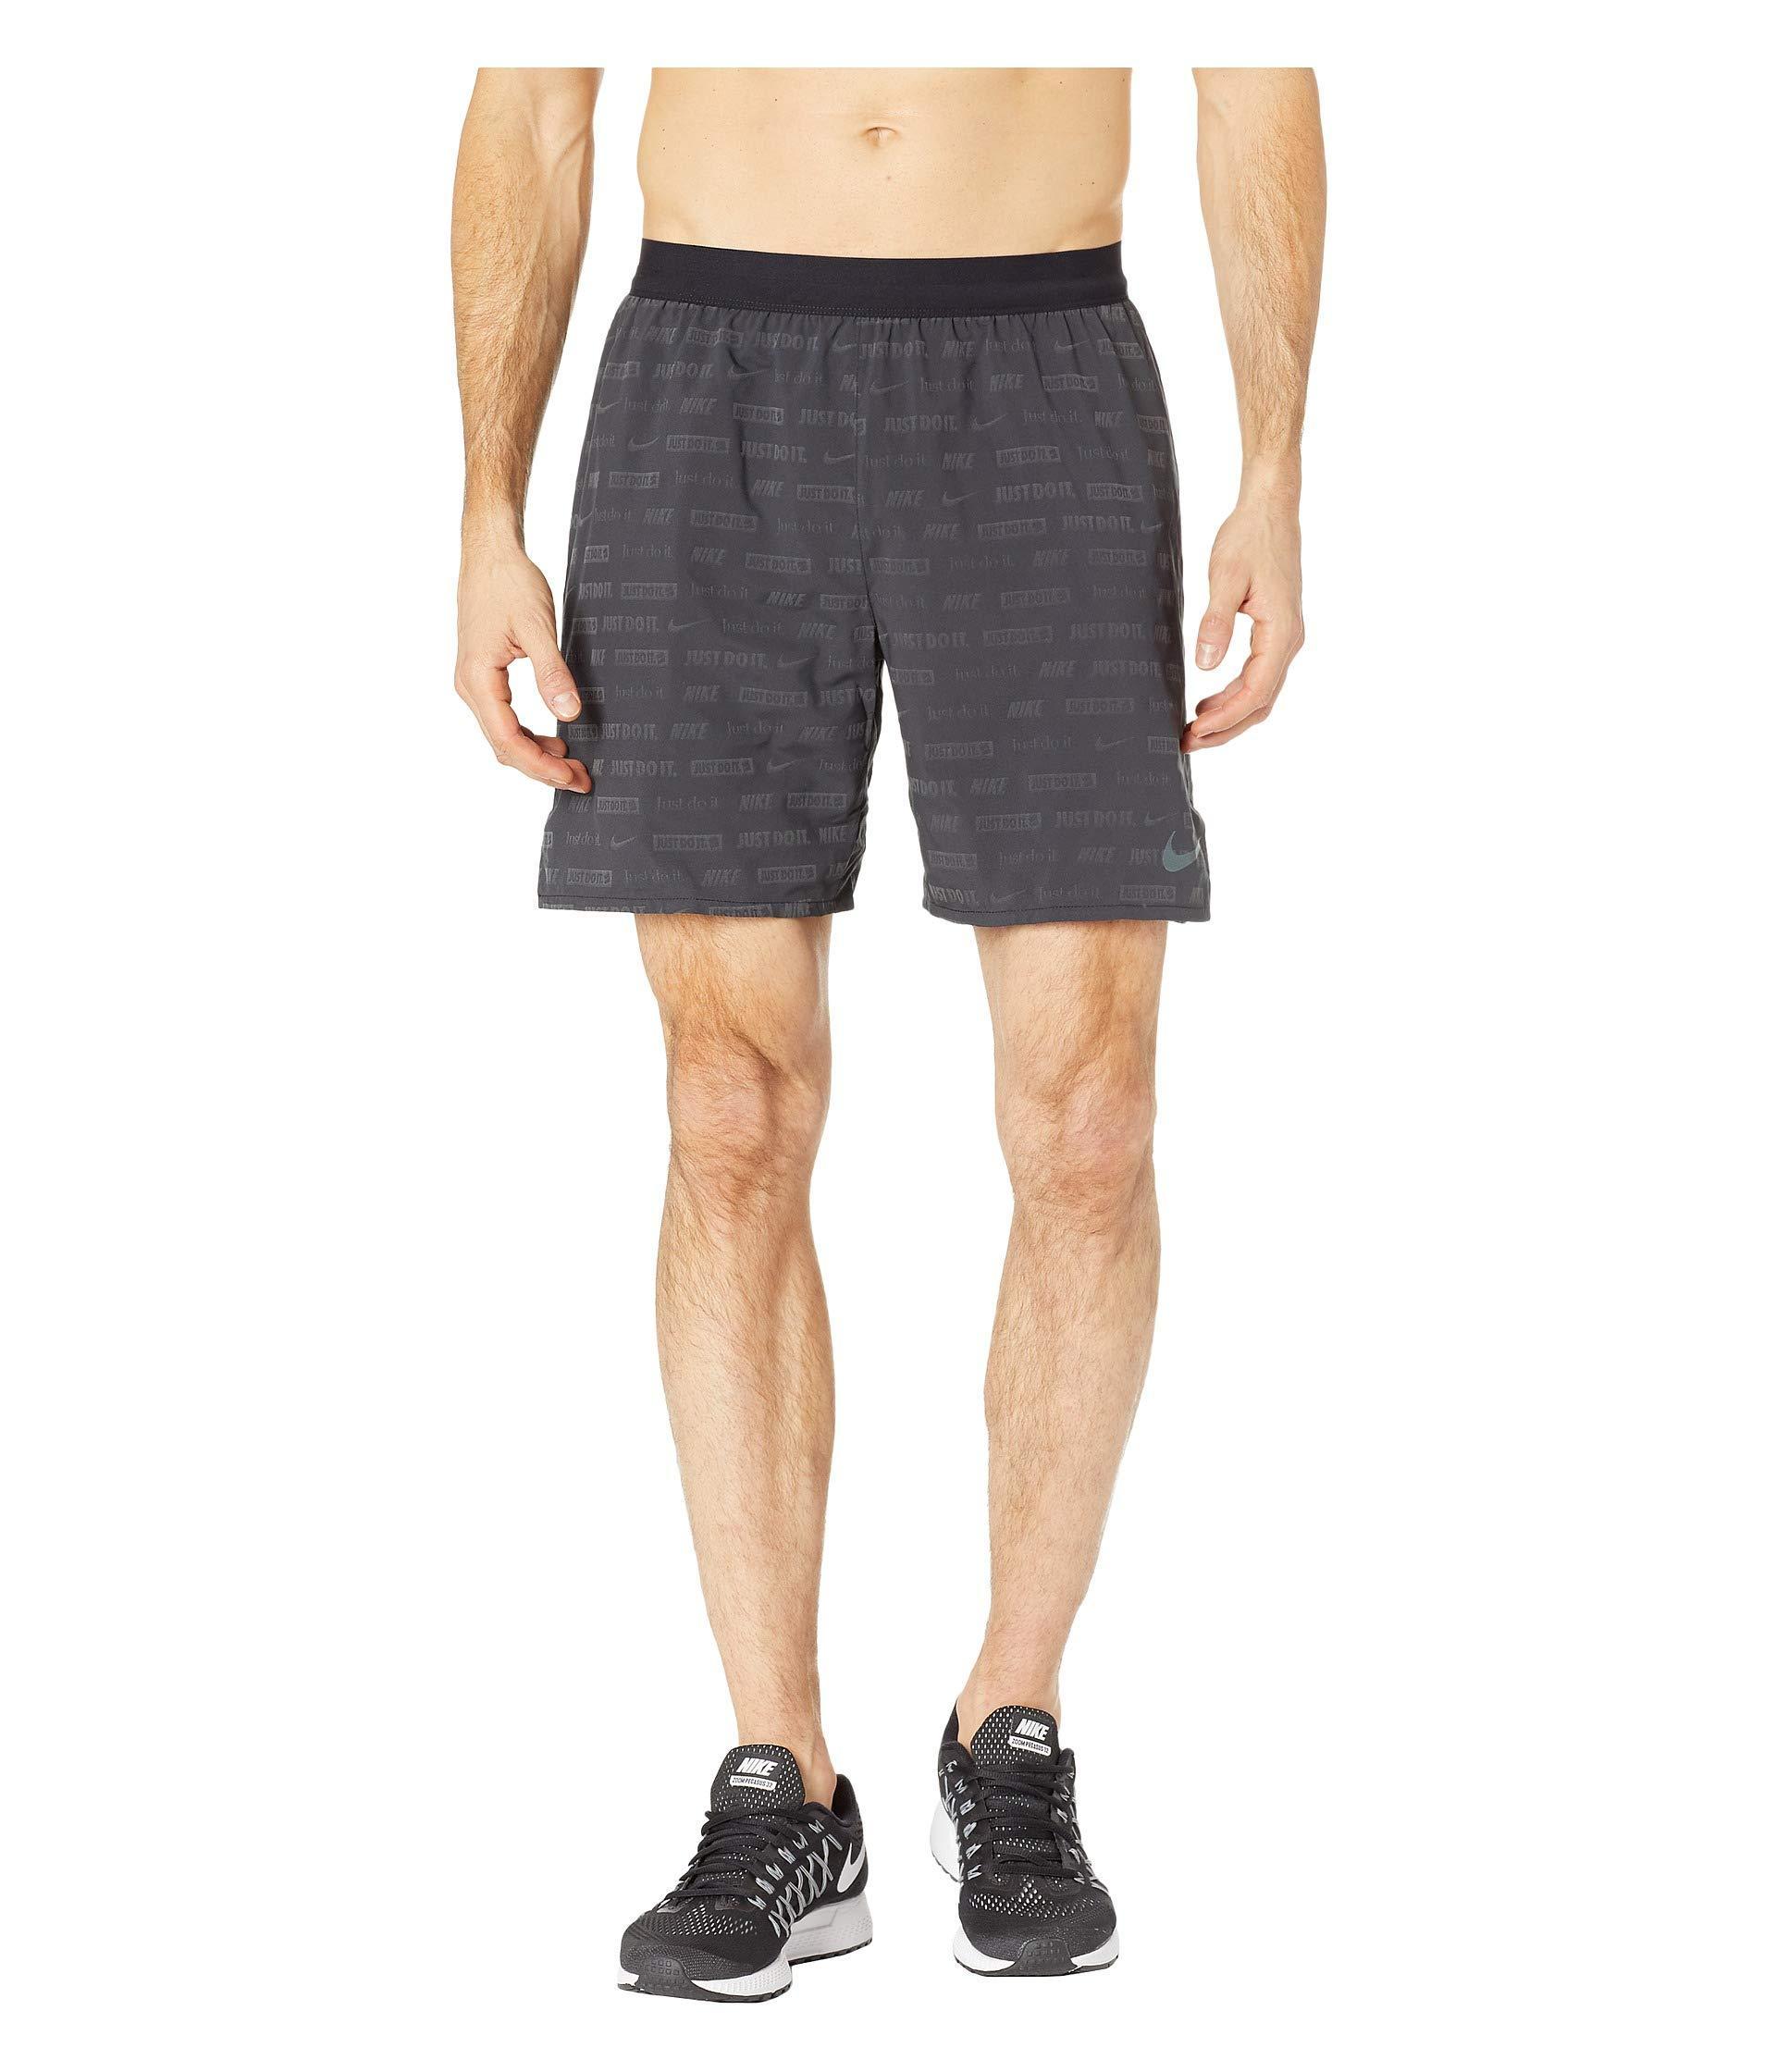 Men's Nike Flx Stride 7